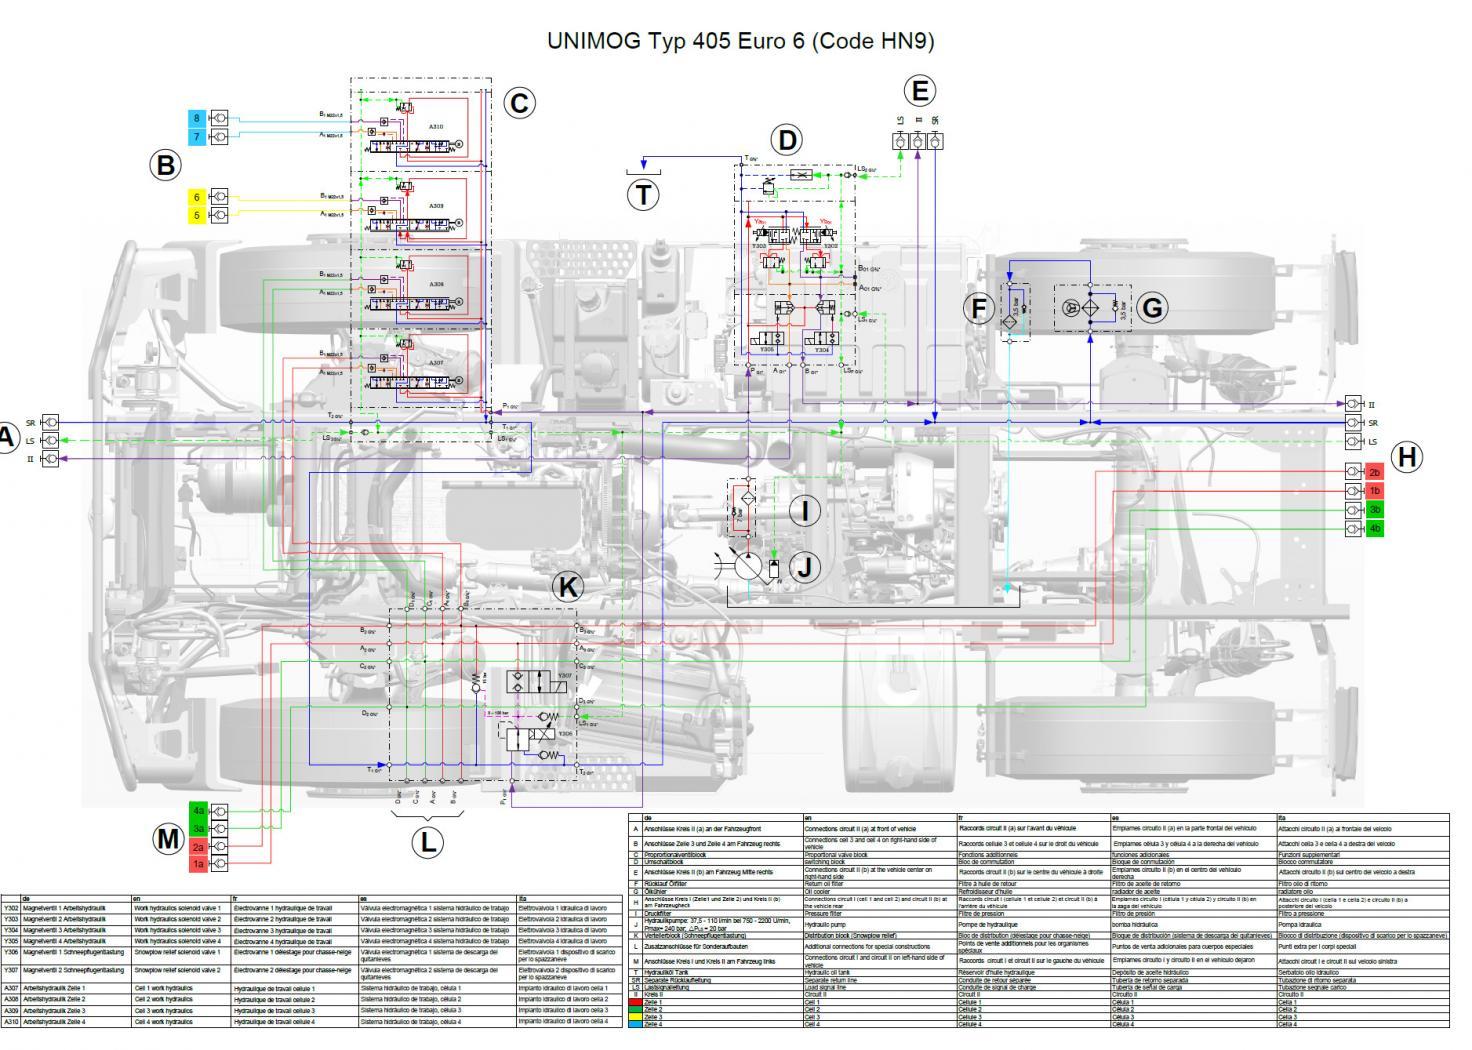 UNIMOG-Typ-405-Euro-6-Code-HN9.jpeg